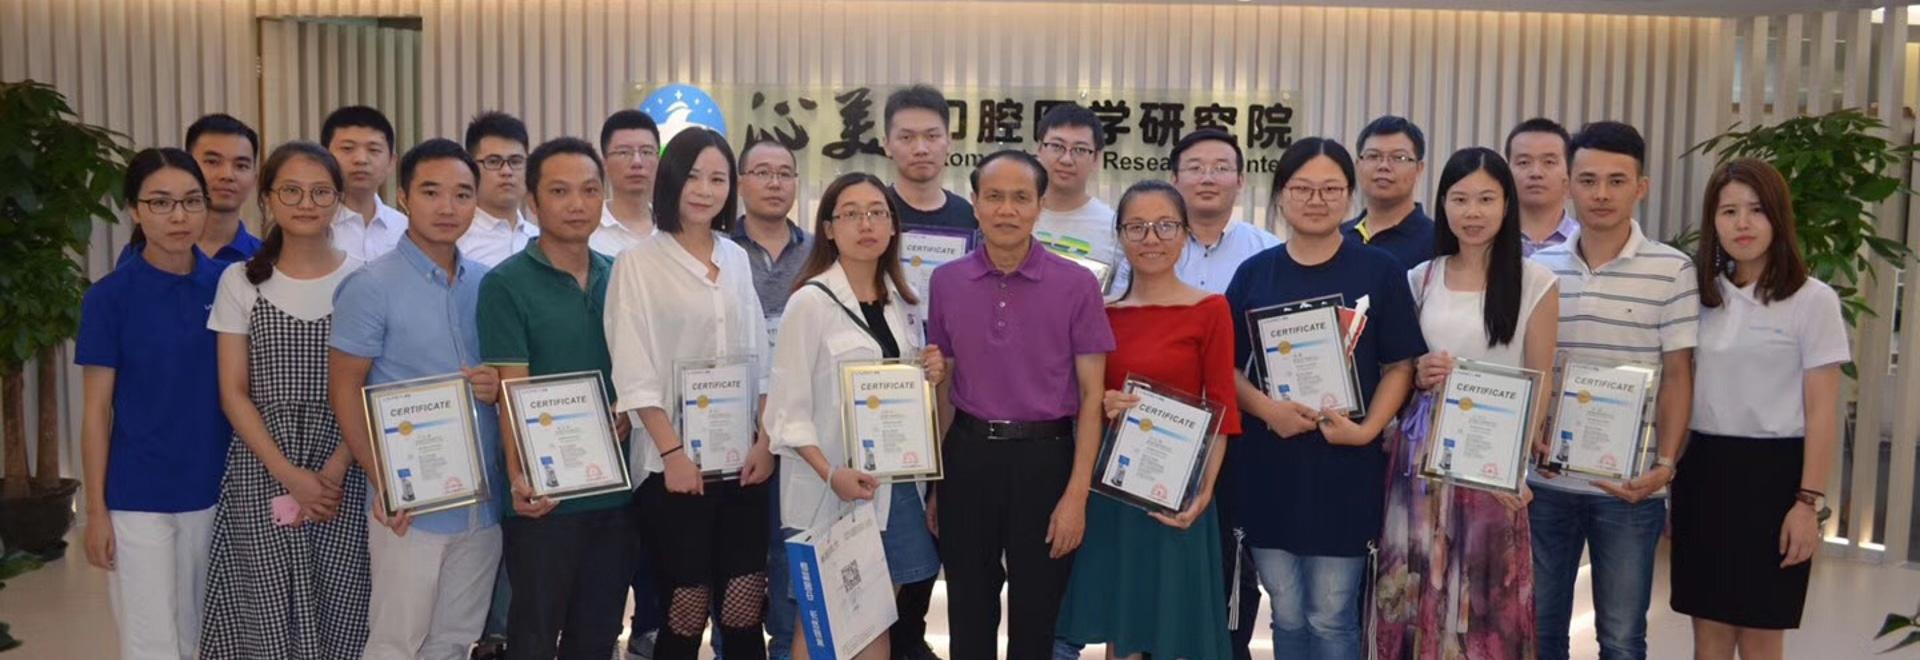 Launca digital junior training successful conclusion in Guangzhou station